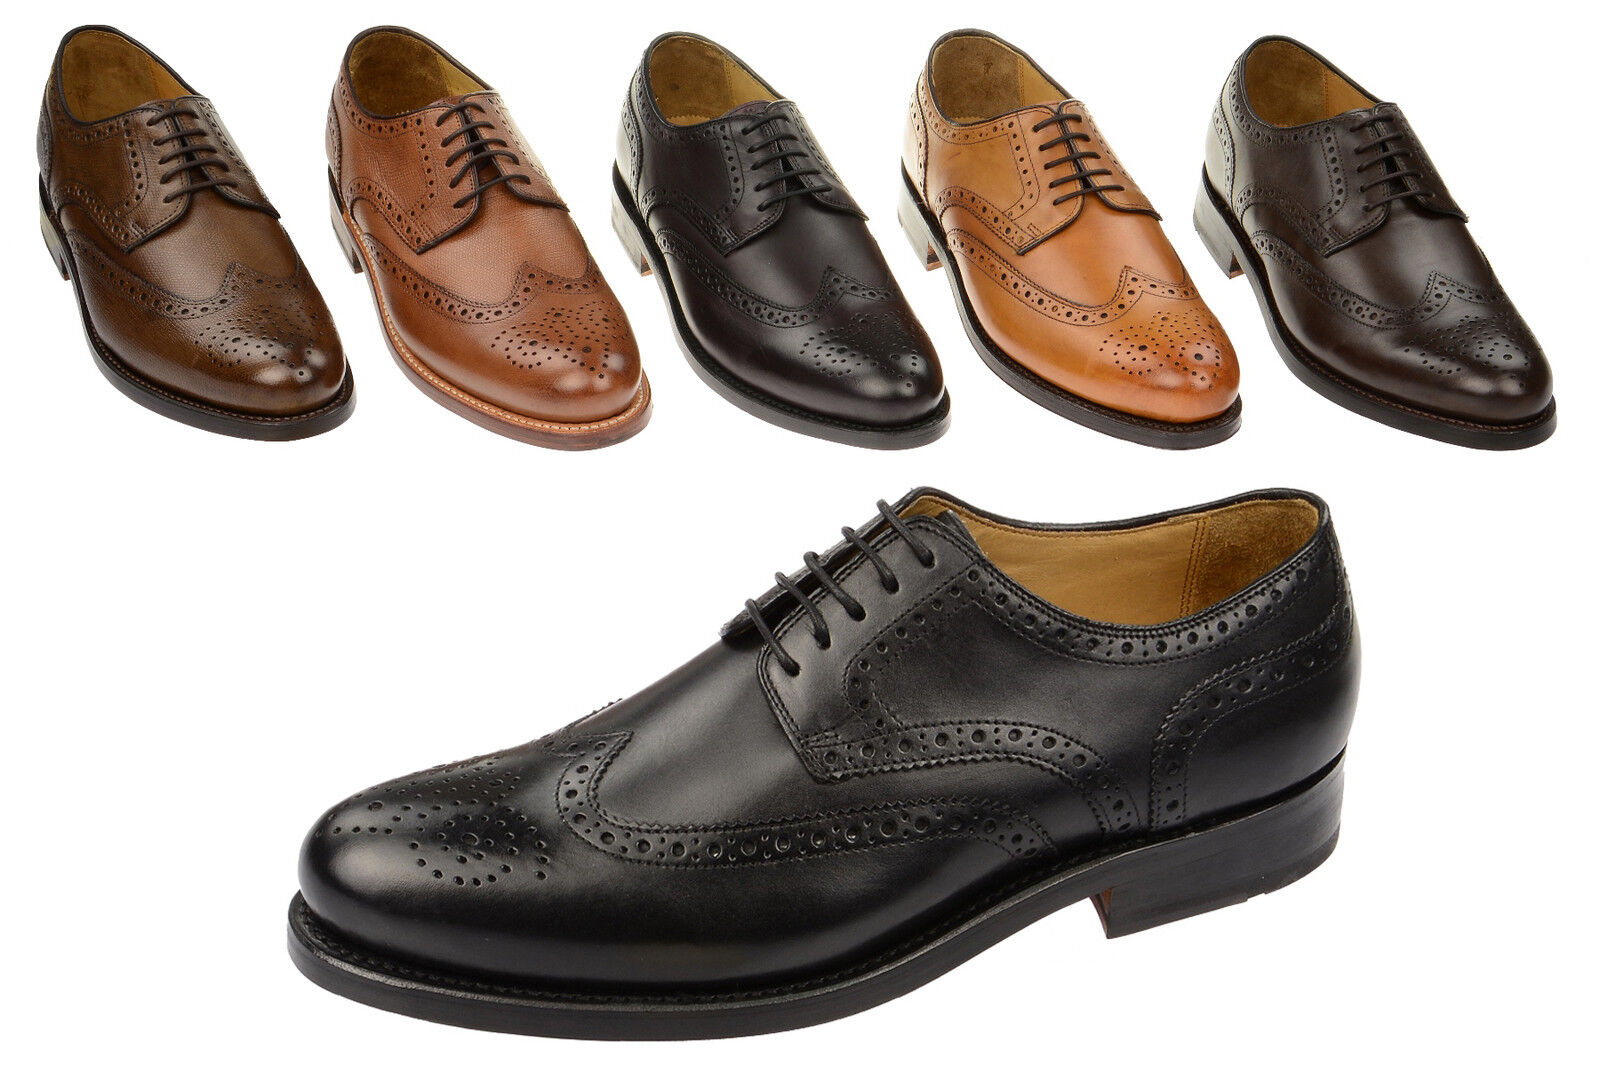 Rahmengenähte Schuhe & GoodYear Welted Ledersohle Gordon & Schuhe Bros Levet 2318 f30aad